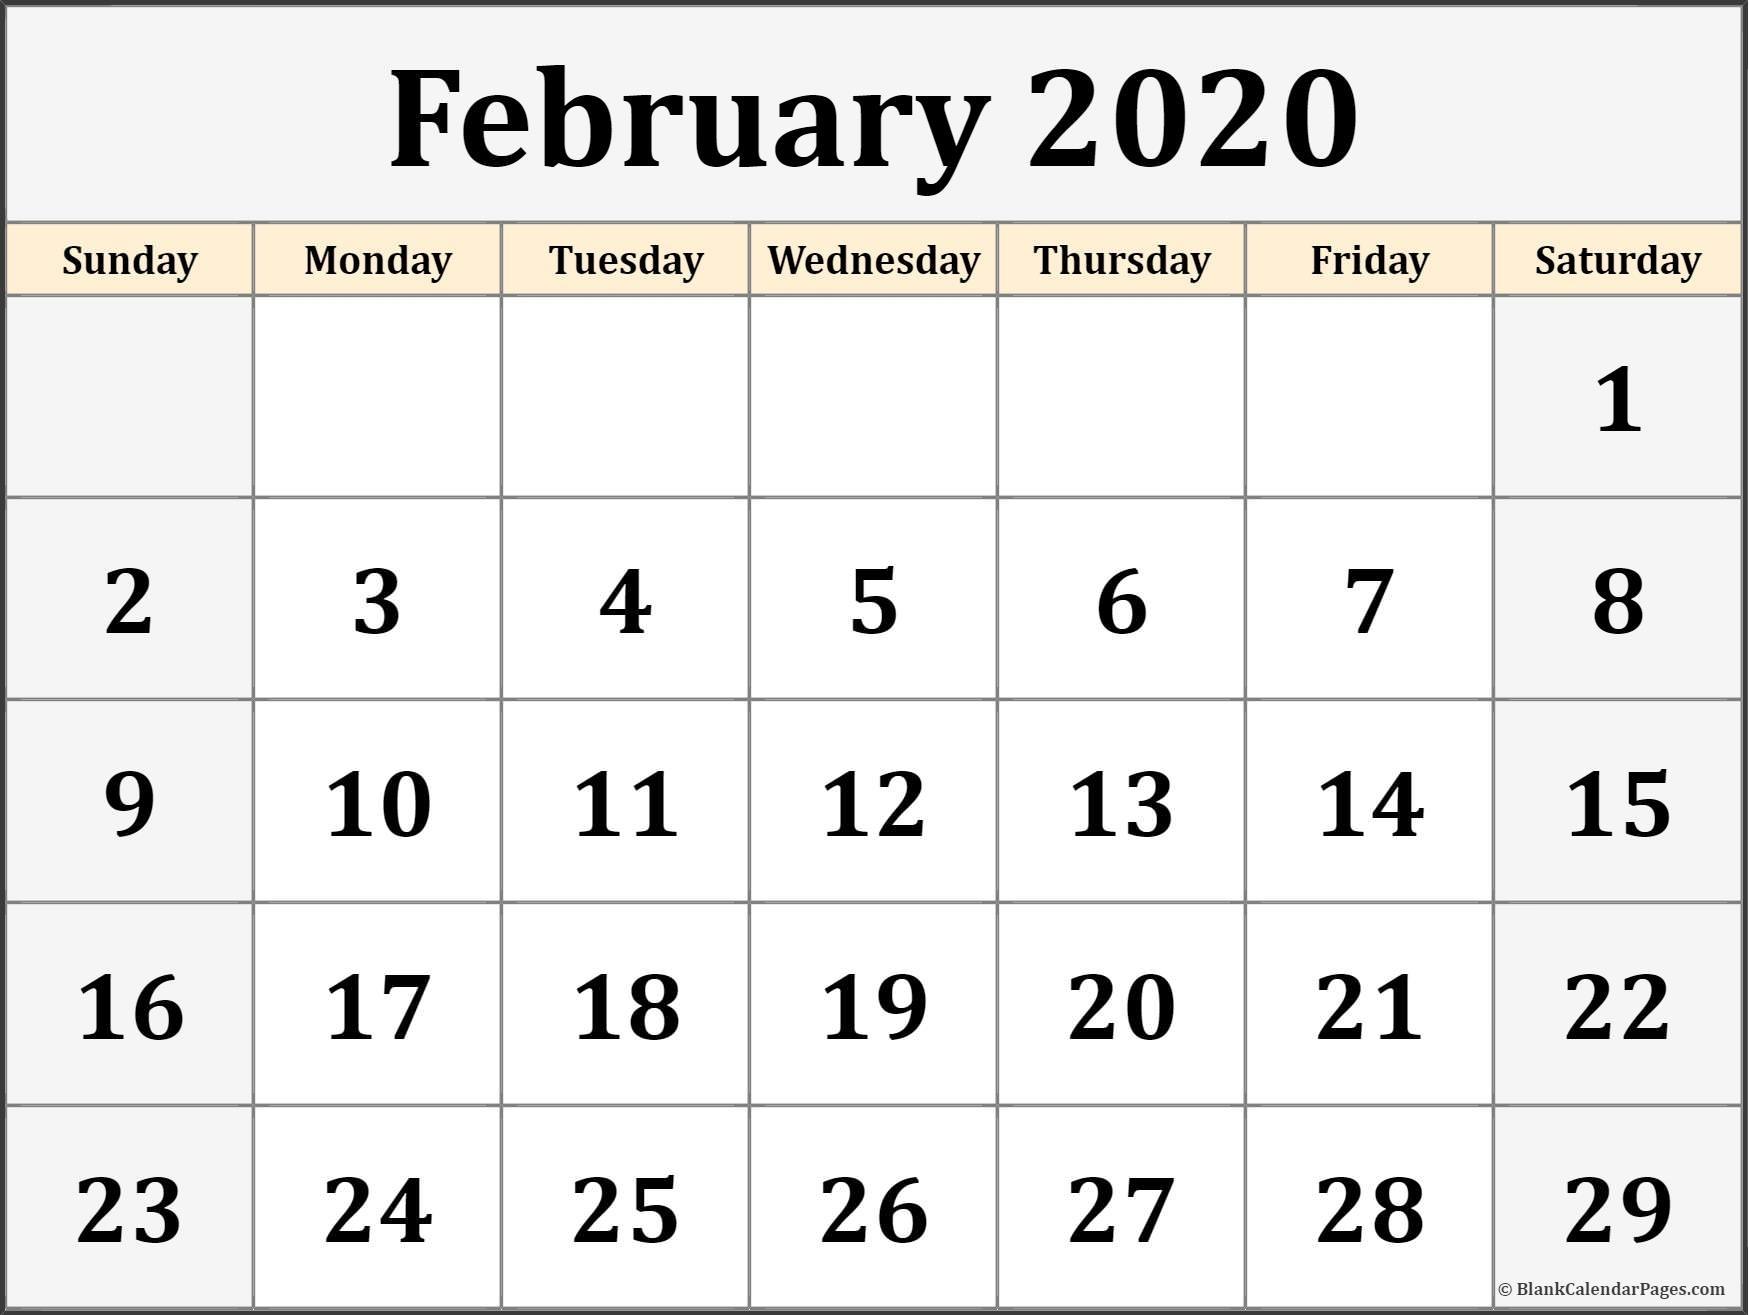 February 2019 Calendar Pdf - Free Printable Calendar, Templates And in Kalnirnay 2020 Holidays